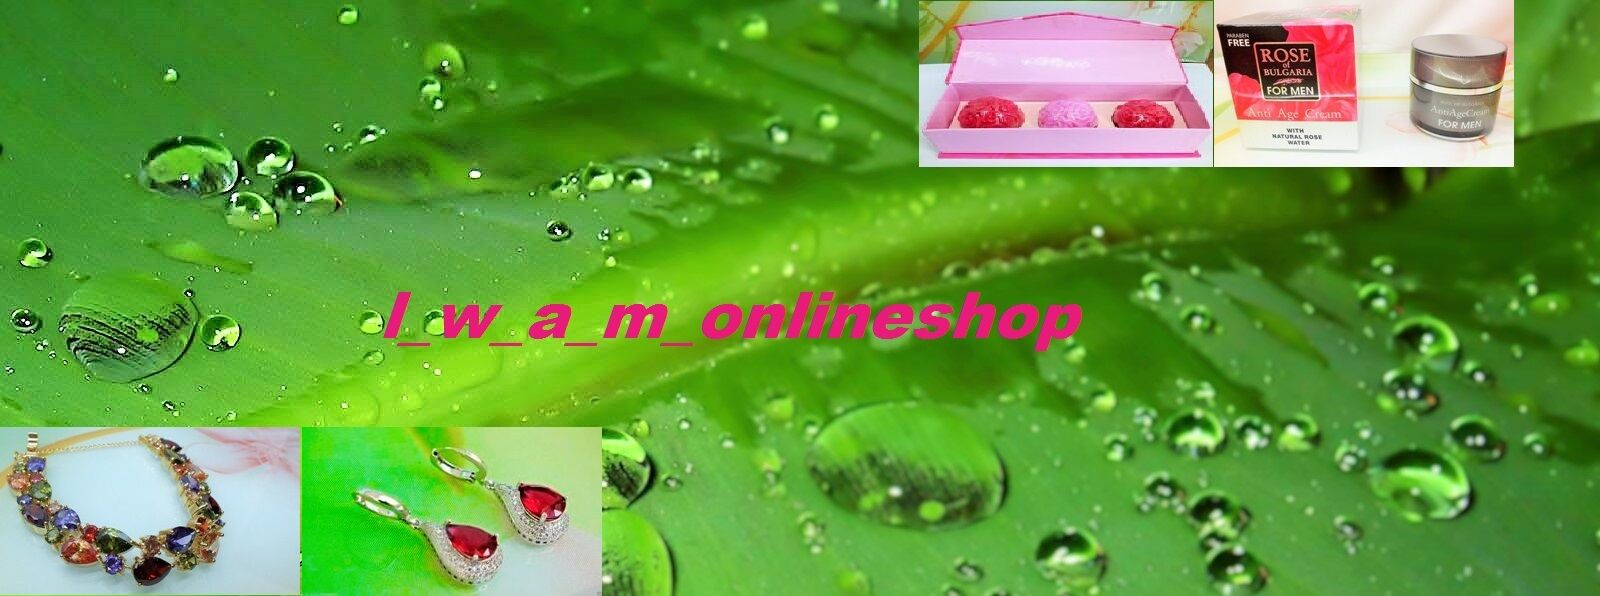 l_w_a_m_onlineshop